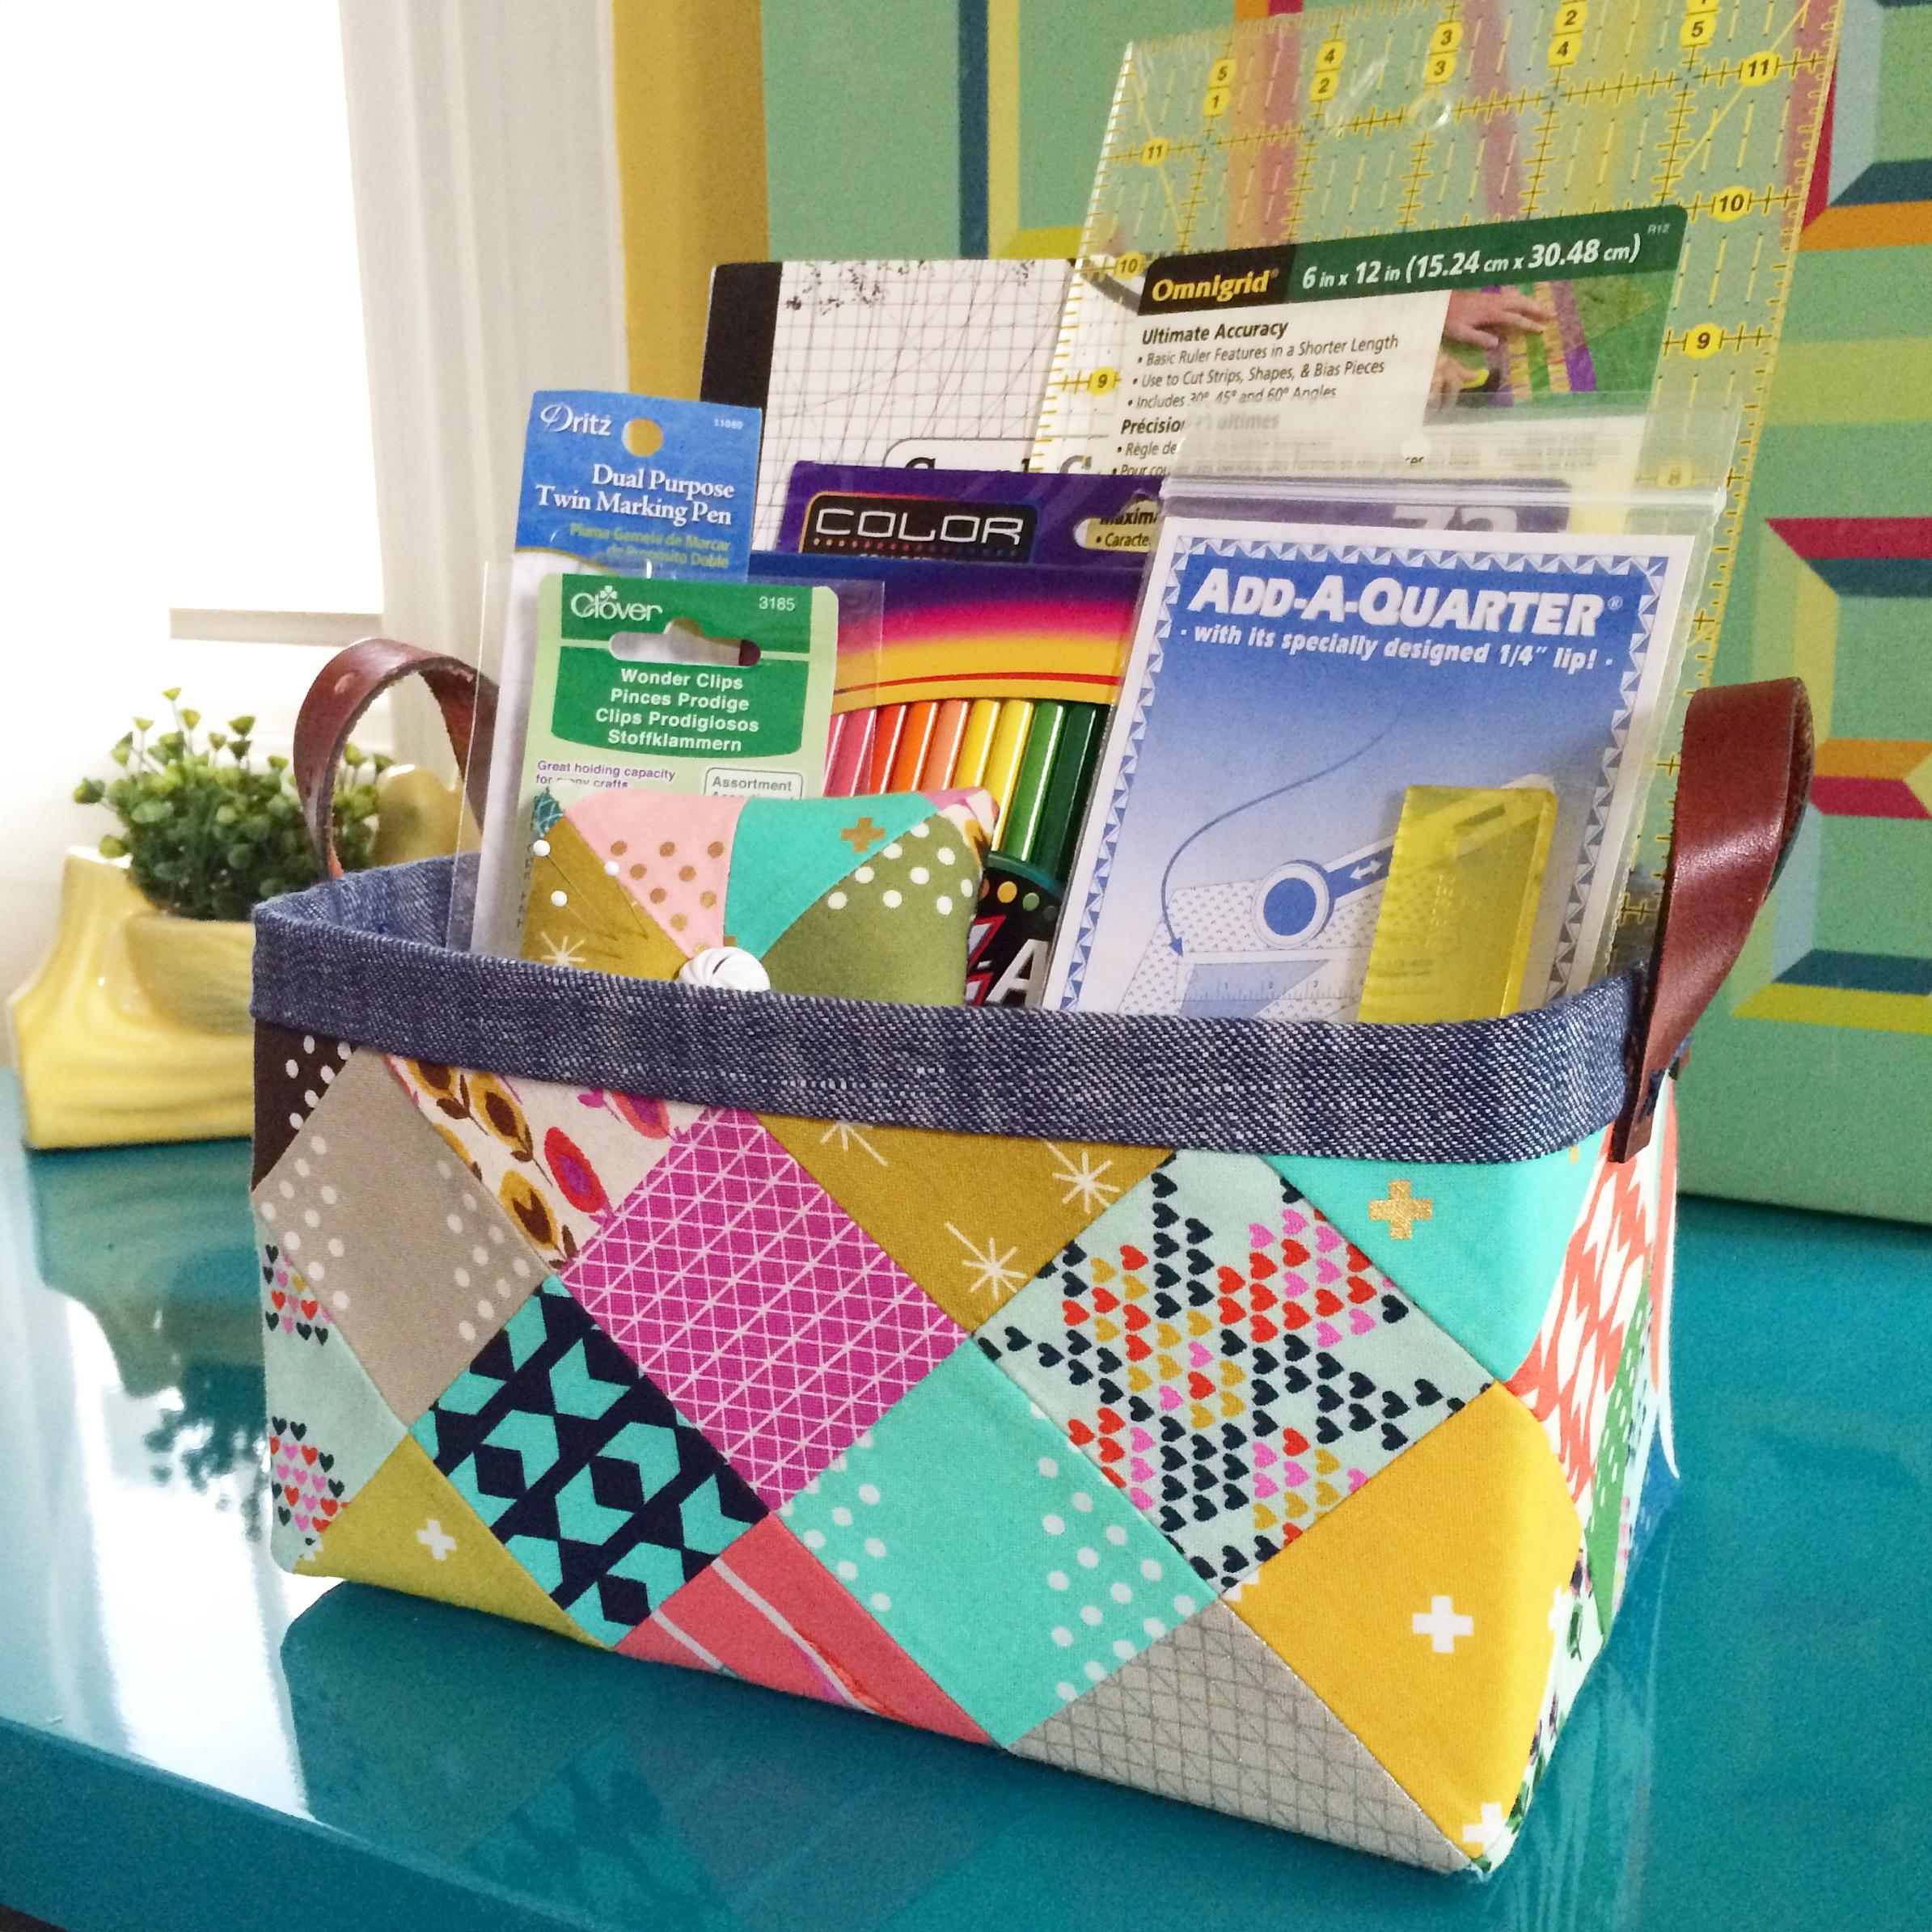 Sturdy Fabric Basket Tutorial – lillyella : quilted basket pattern - Adamdwight.com